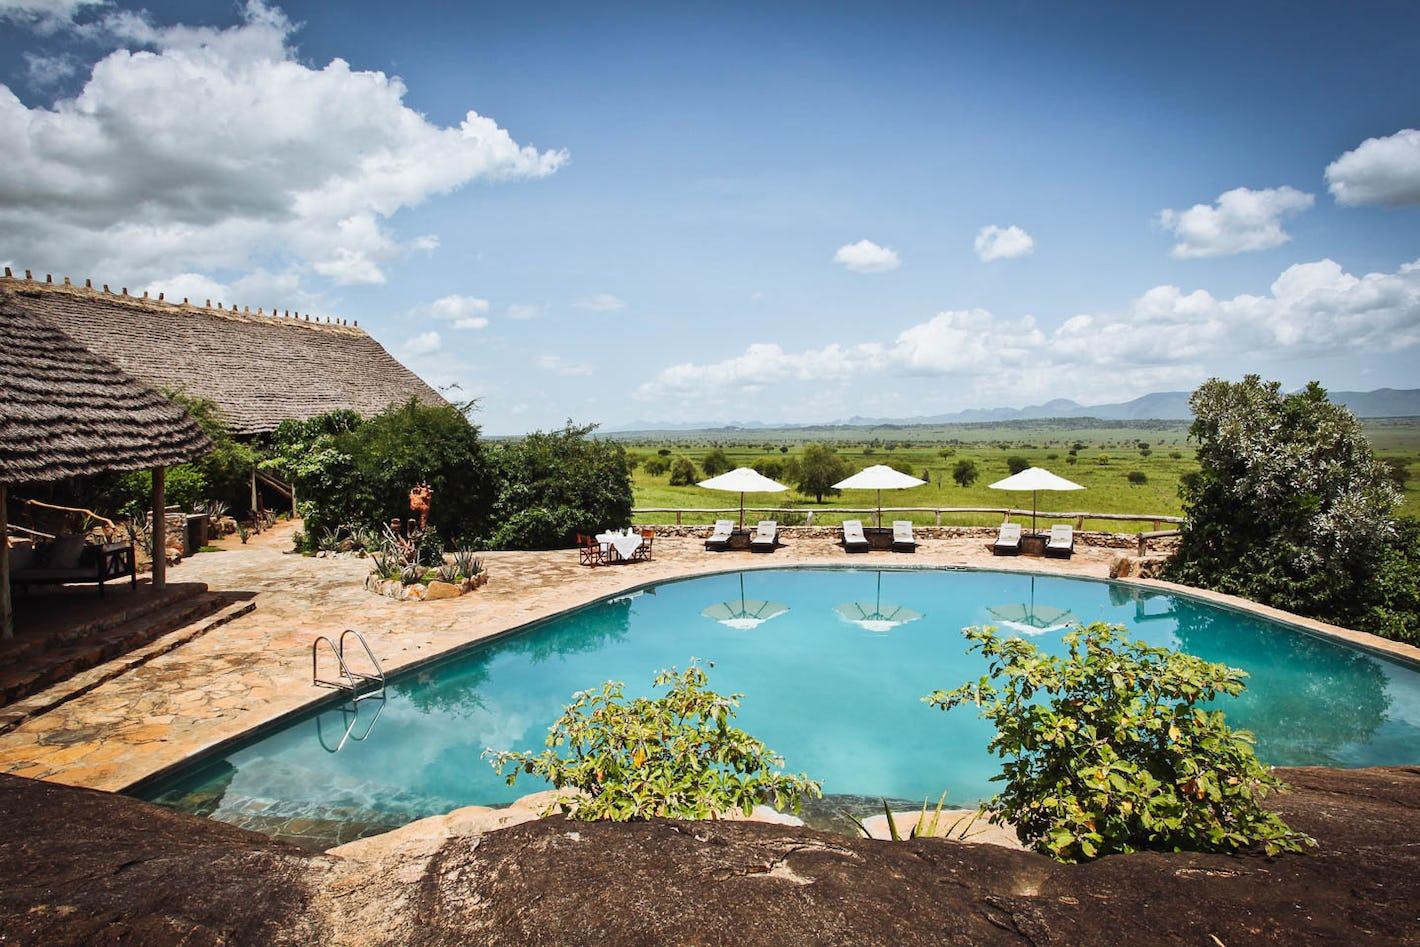 Design your kidepo valley safari online timbuktu travel for Knebel design pool ug